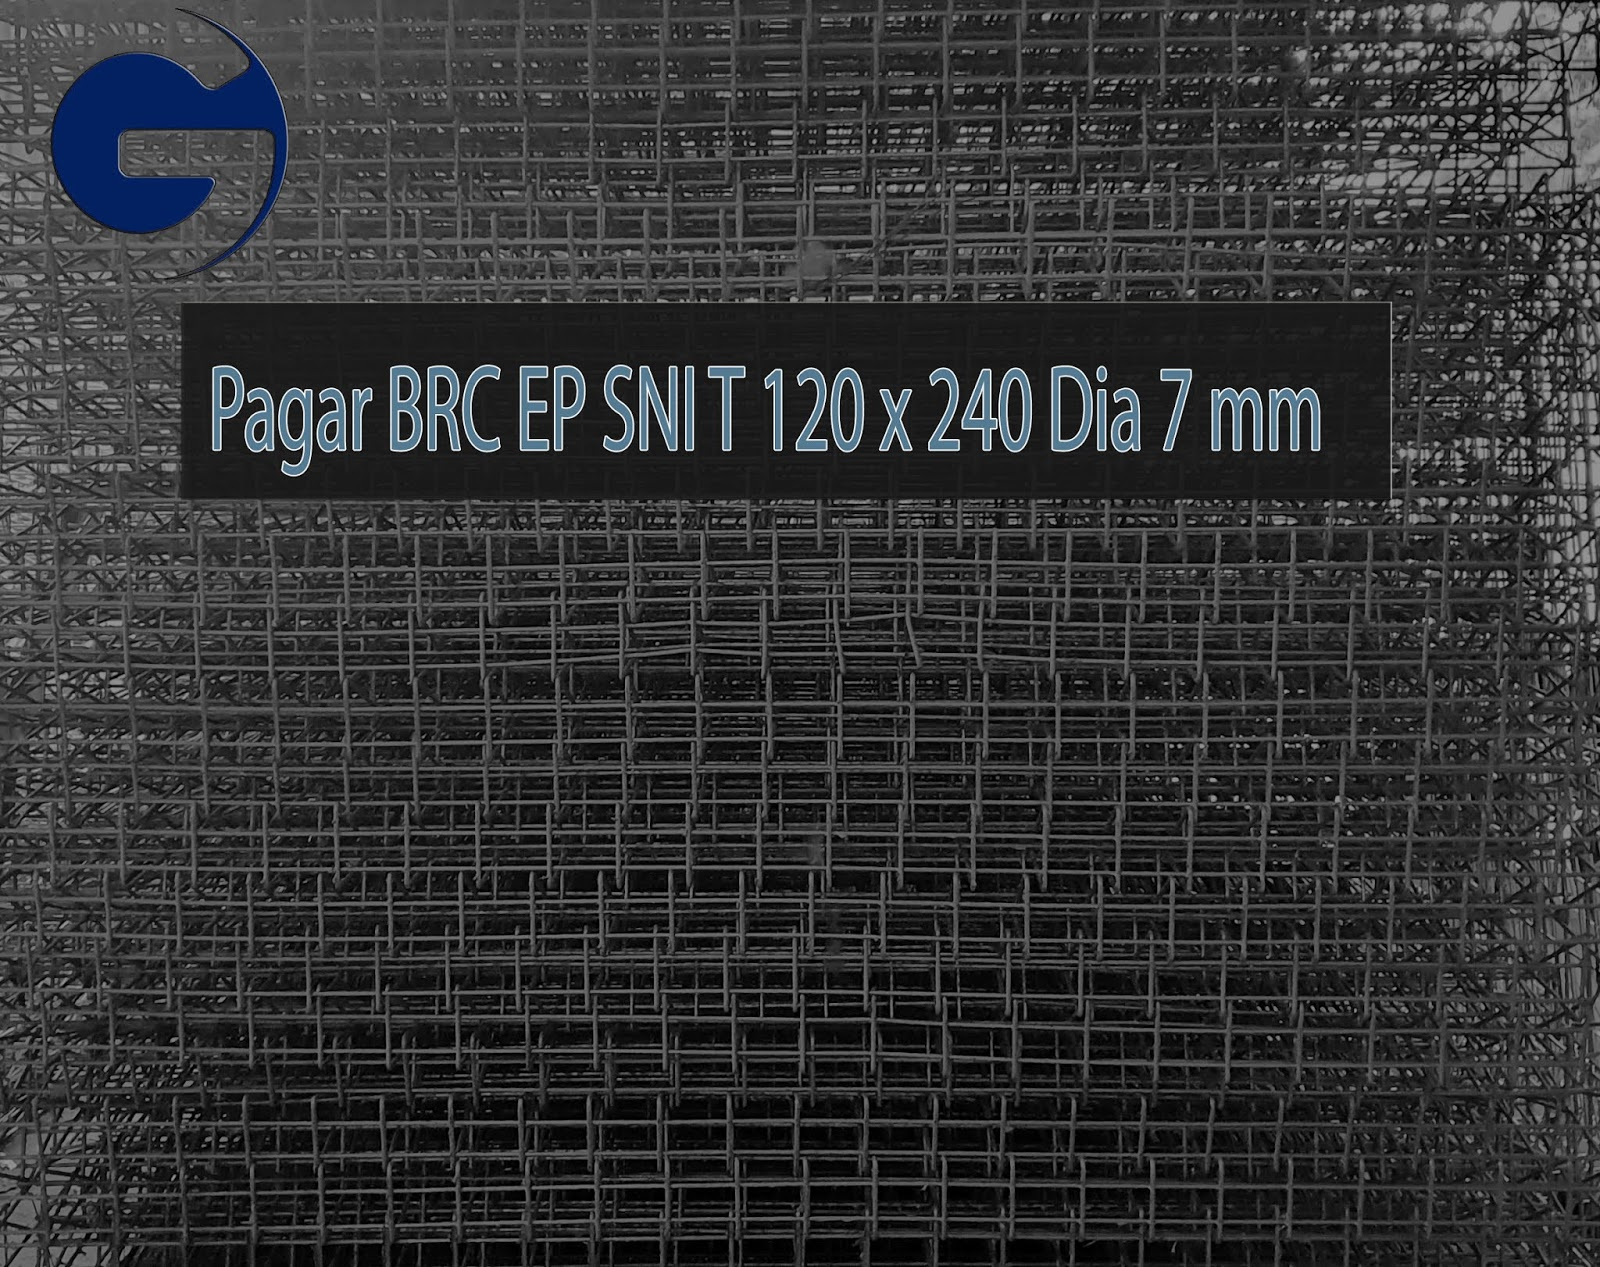 Jual Pagar BRC EP SNI T 120 x 240 Dia 7 mm